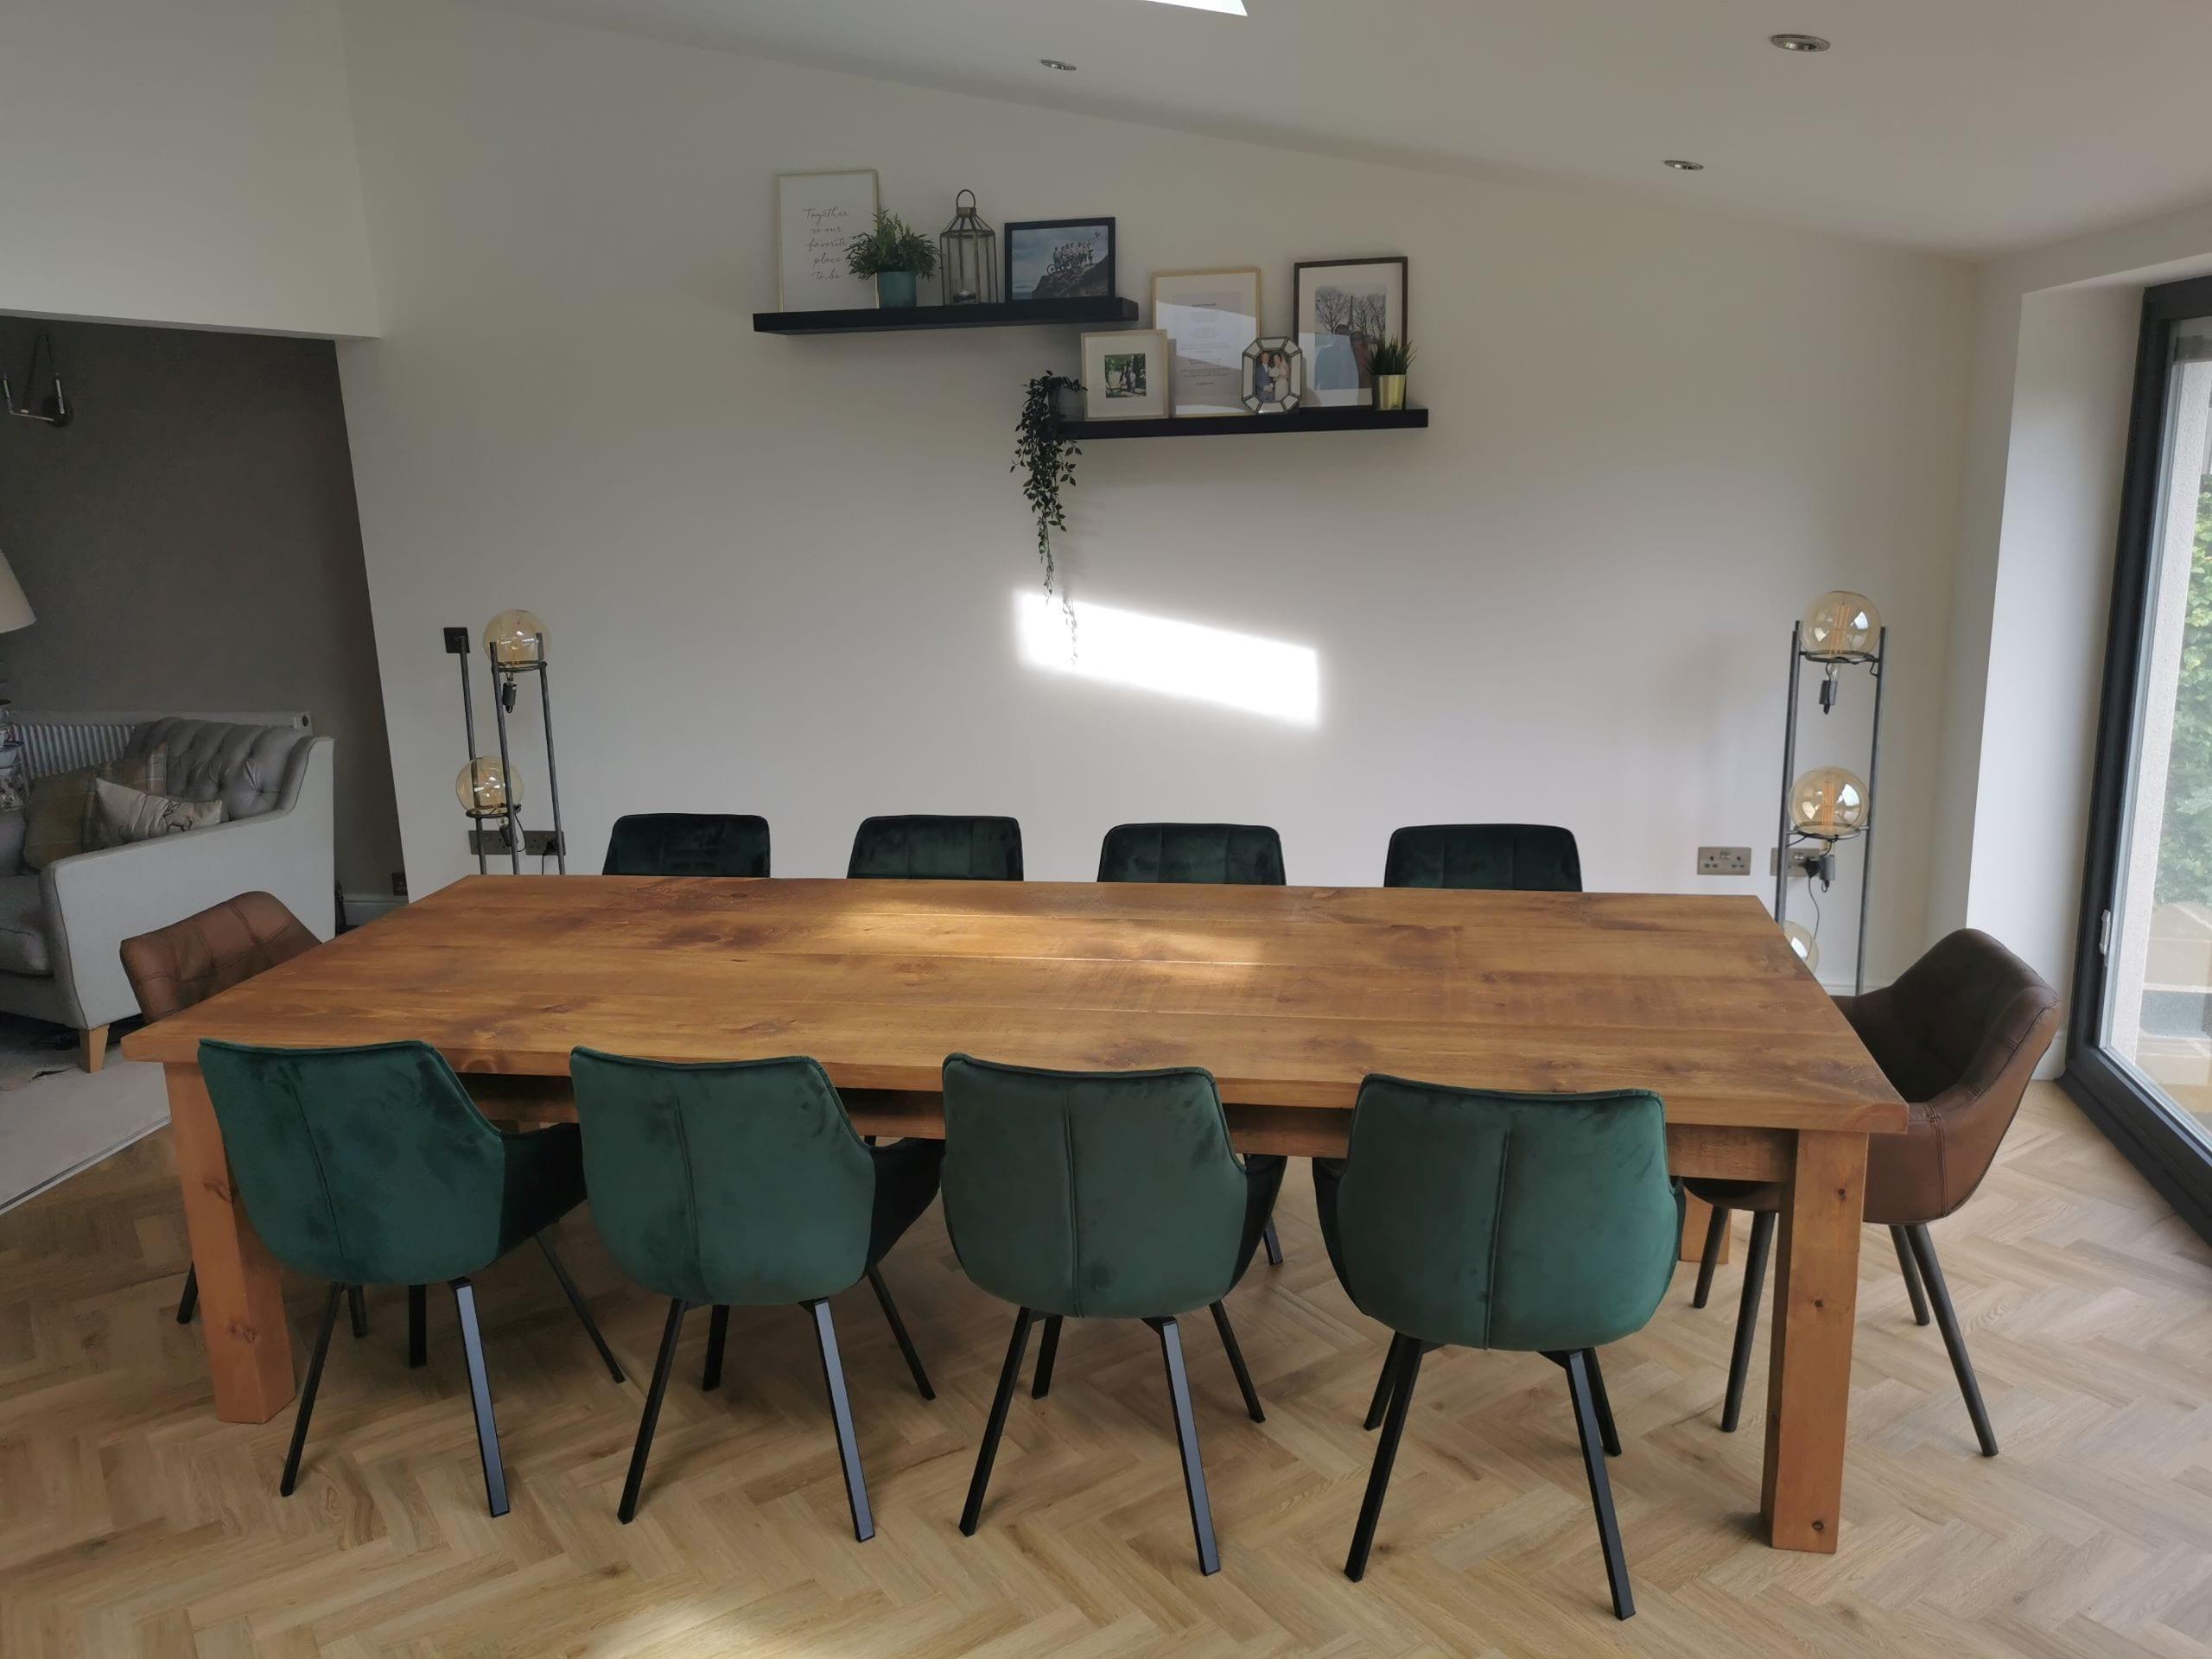 Bespoke-Large-Rustic-Table